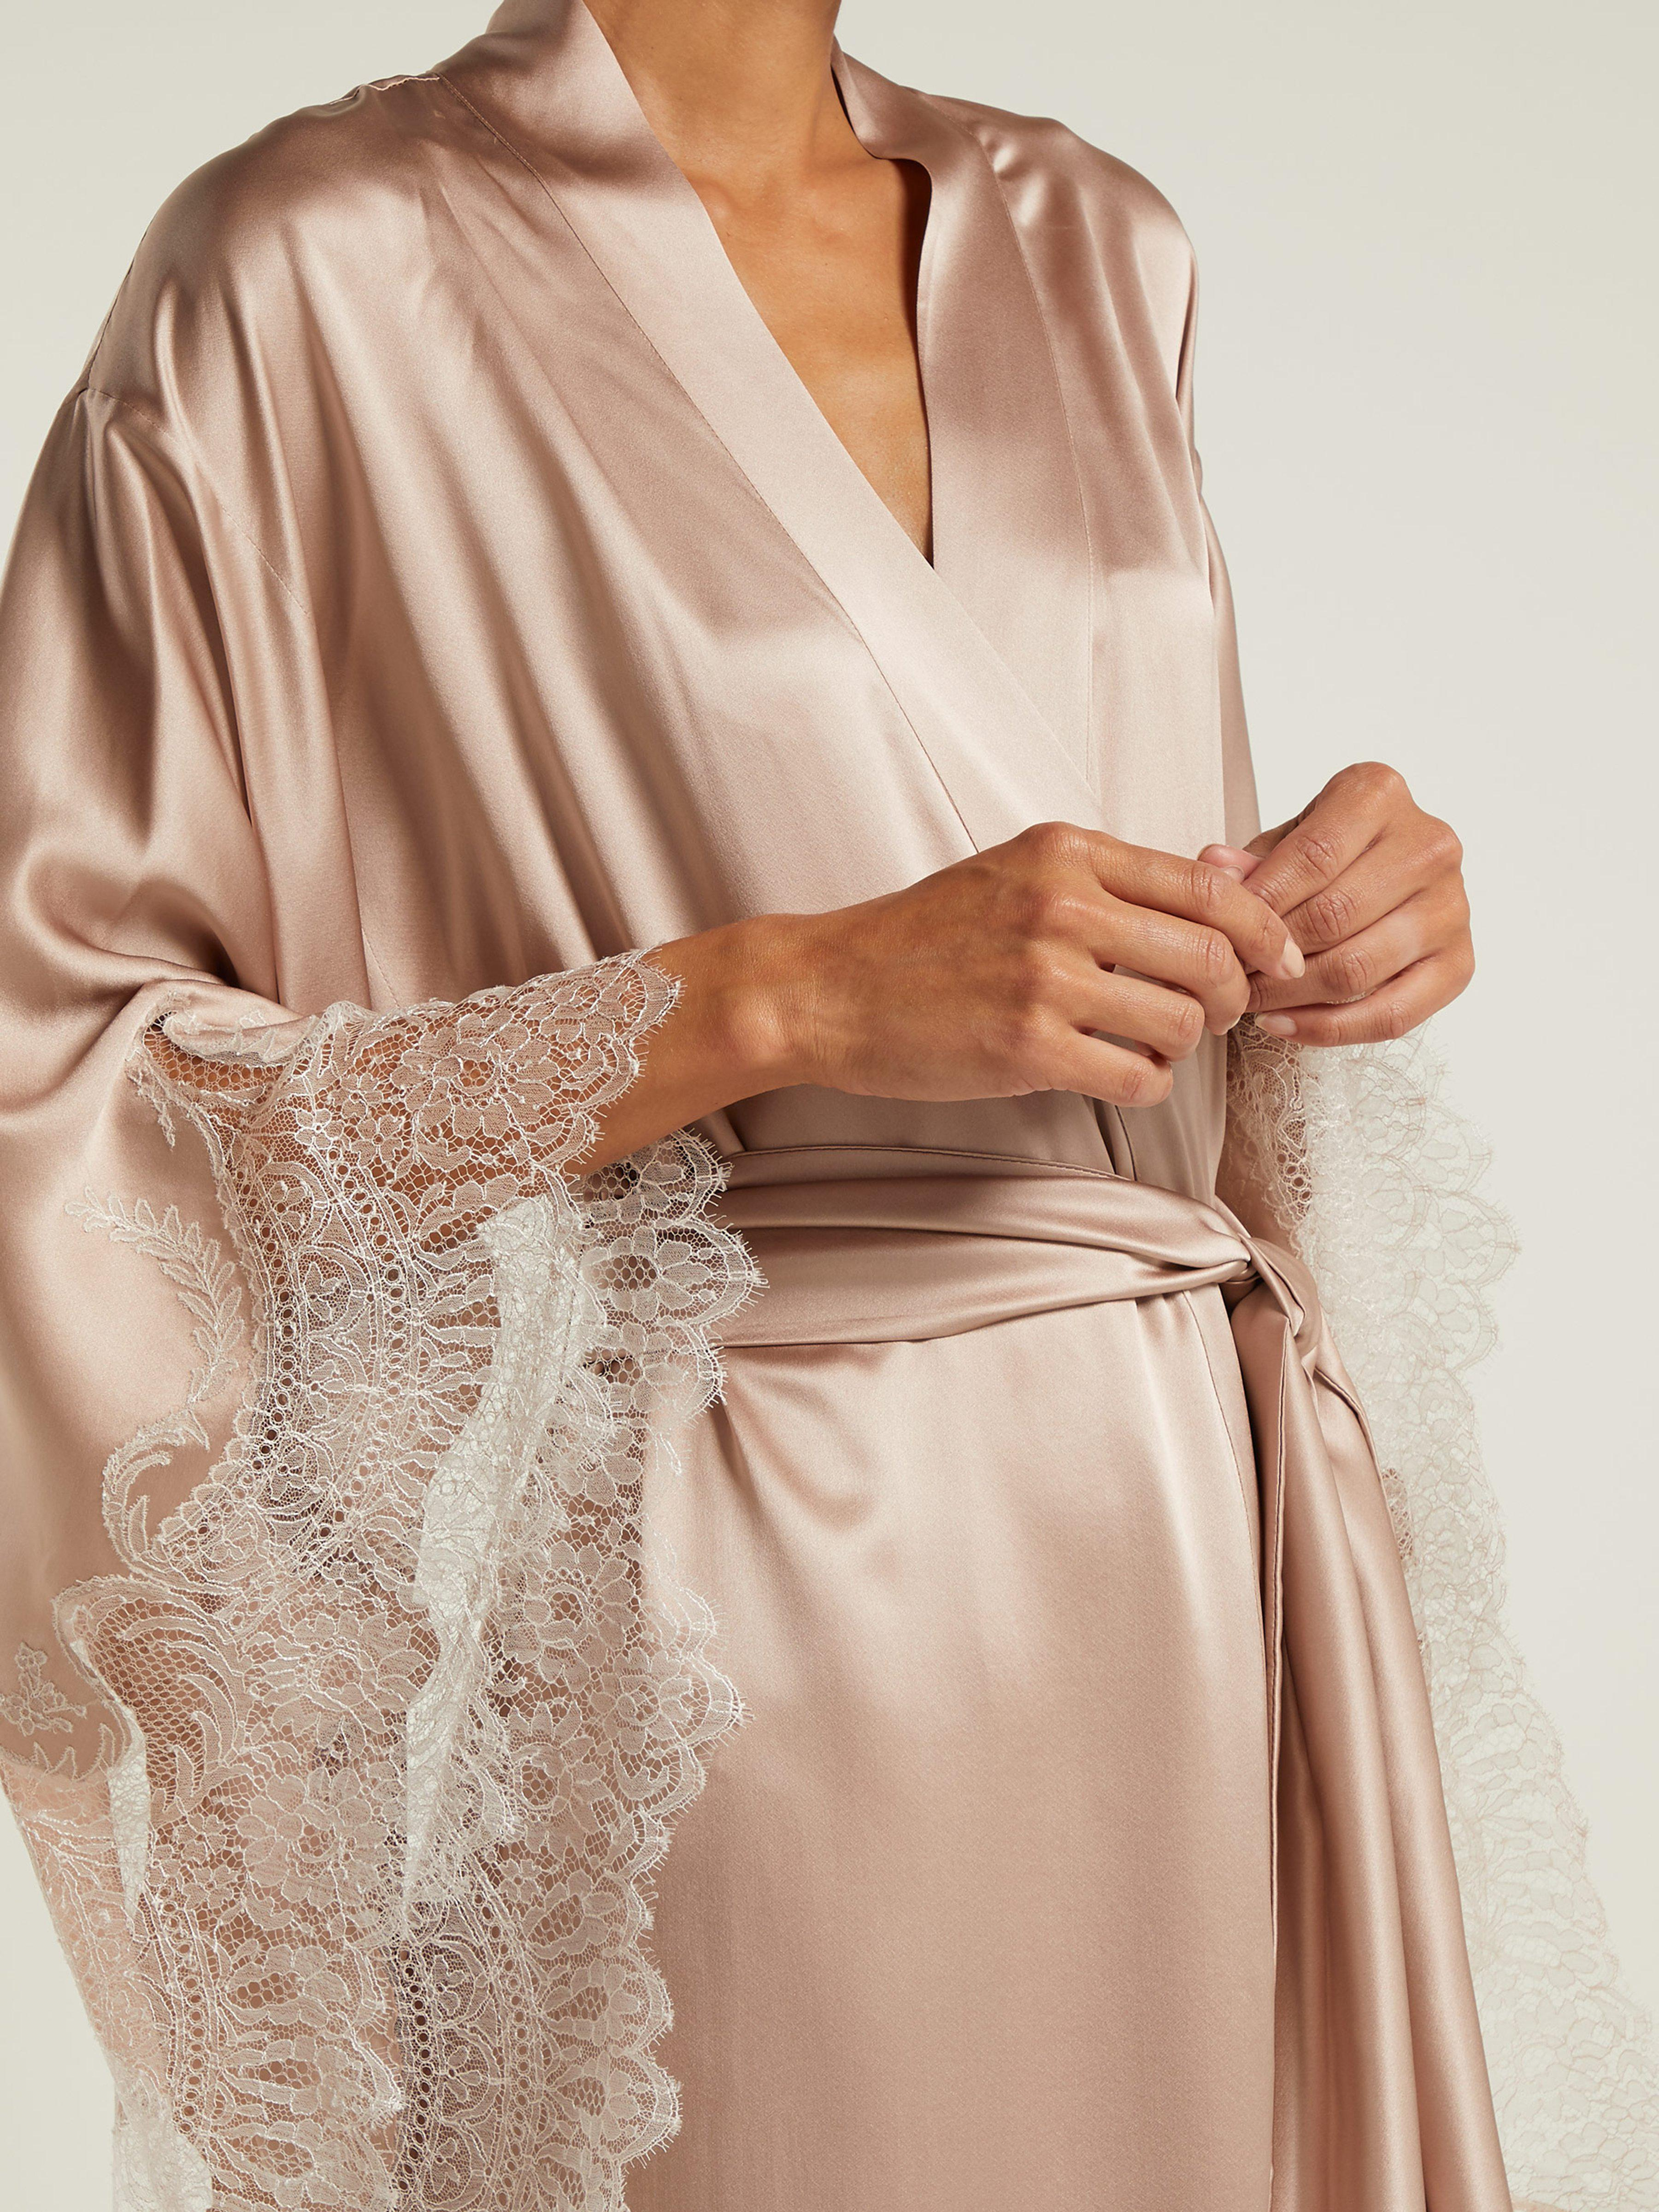 Carine Gilson Lace Embroidered Silk Satin Robe in Pink - Lyst 0ebf55f3e